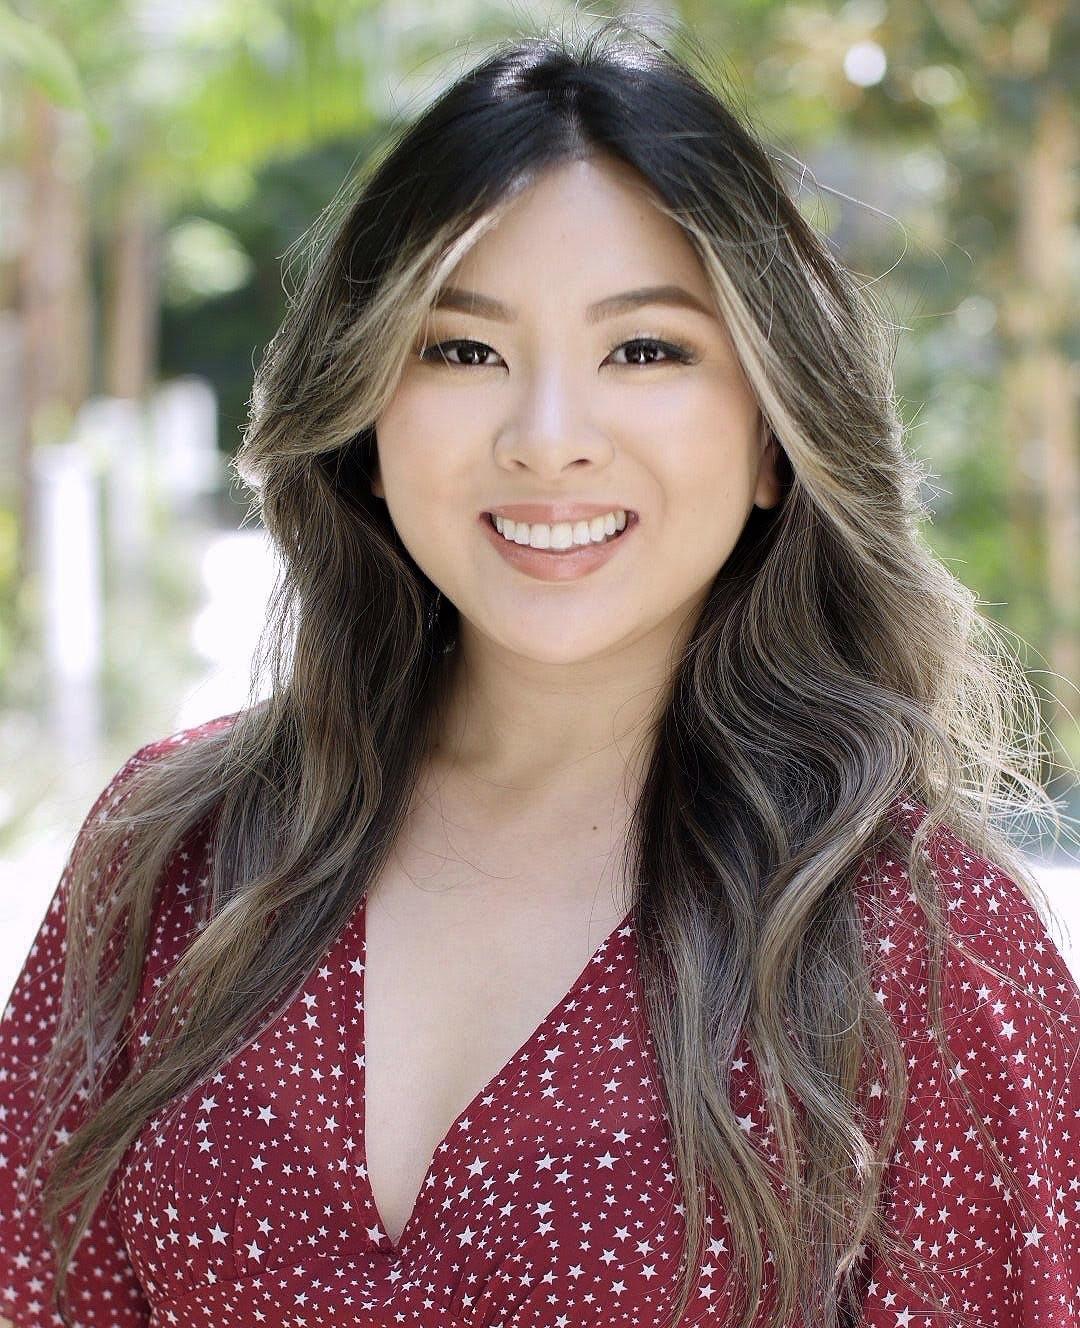 Human Resources Management Graduate Jennifer Pham